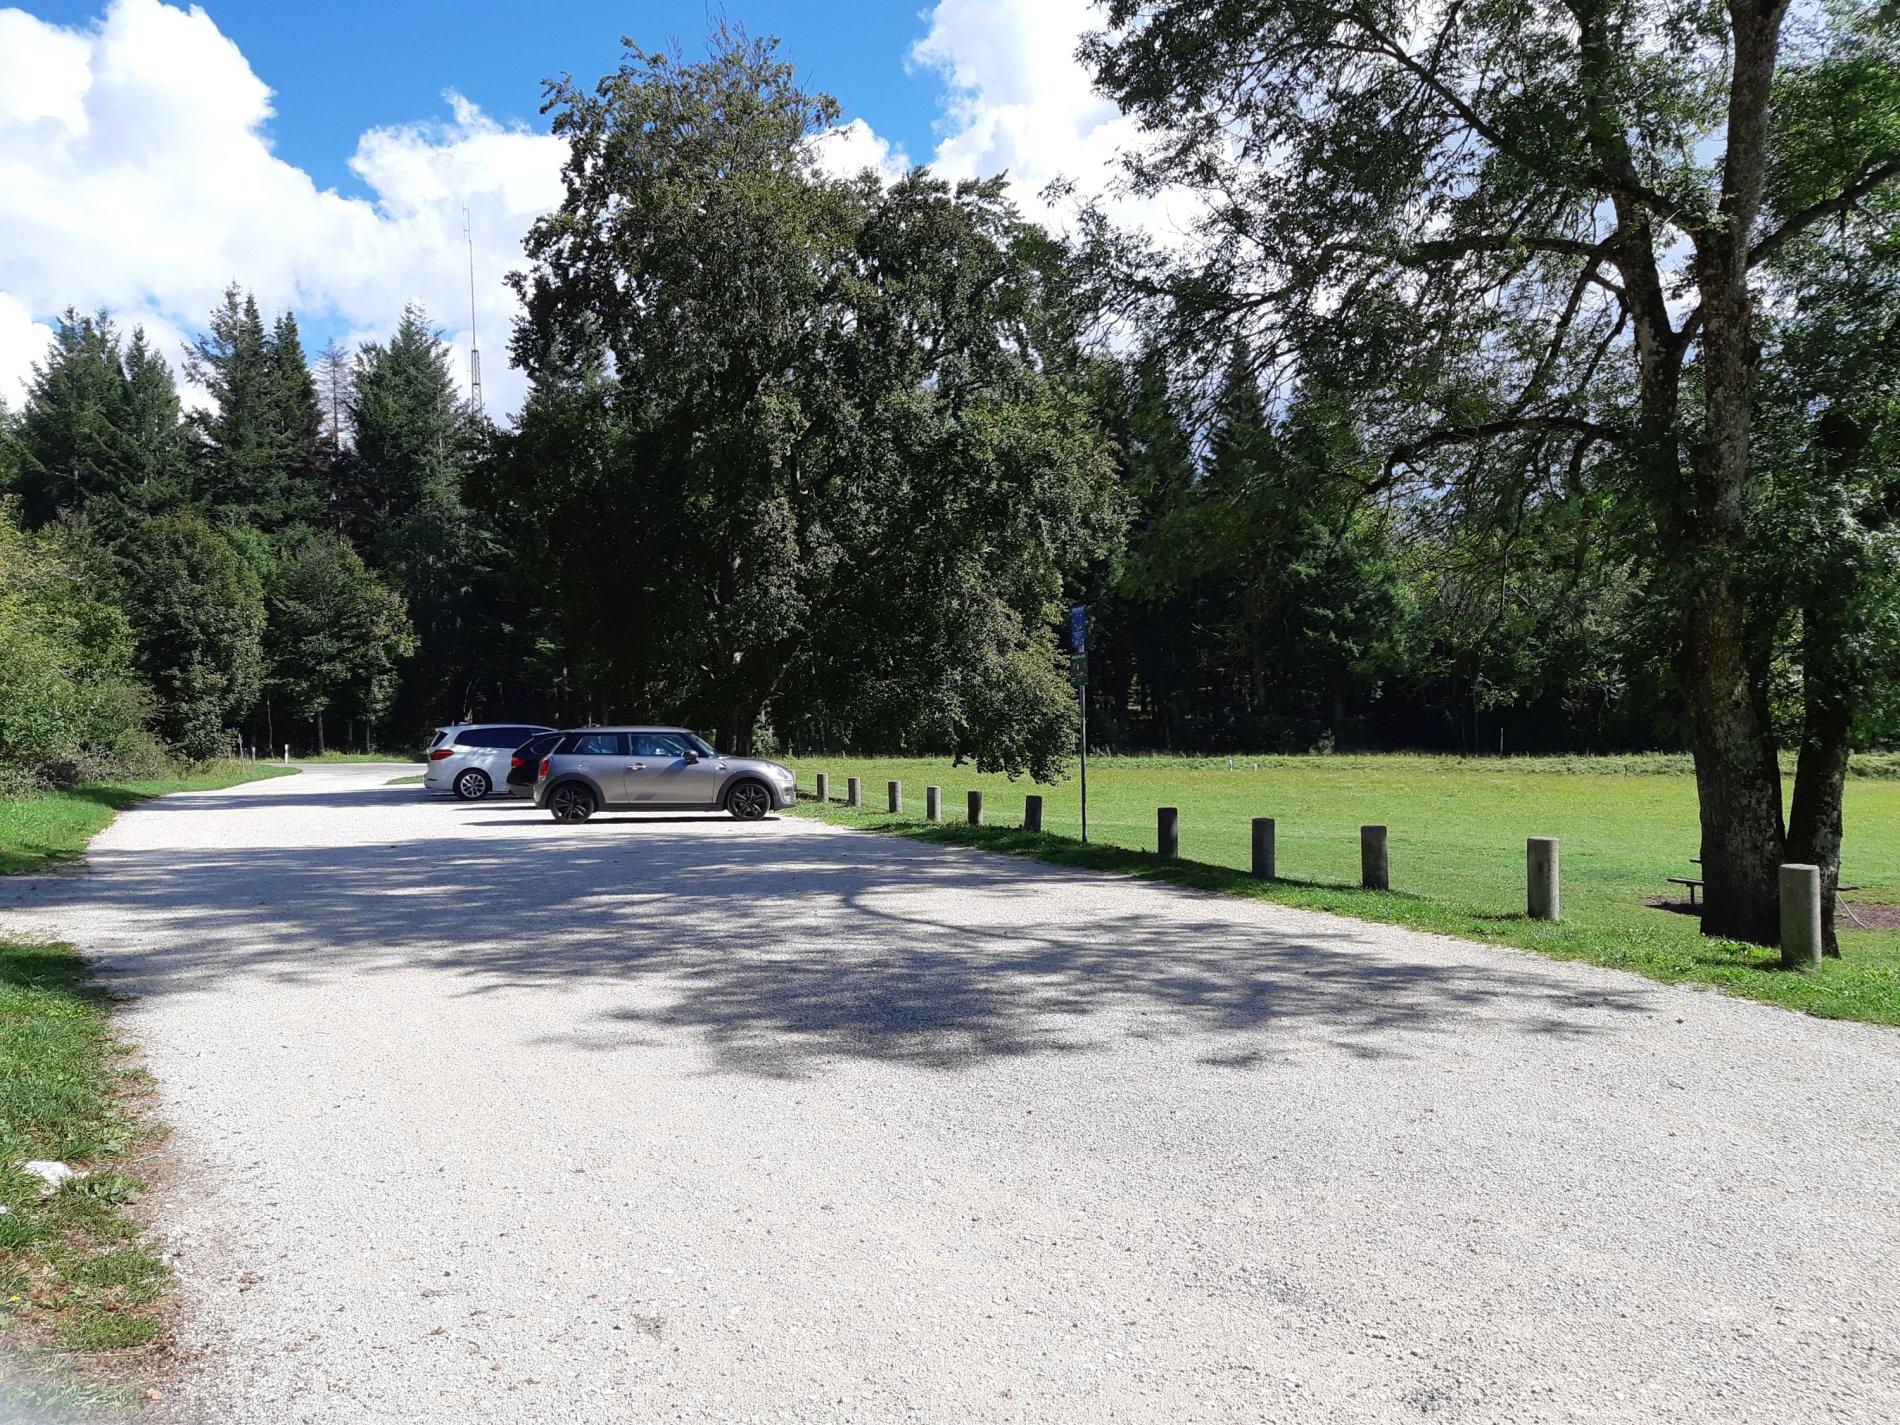 Parkplatz Schneckenbuckel, Albstadt-Onstmettingen